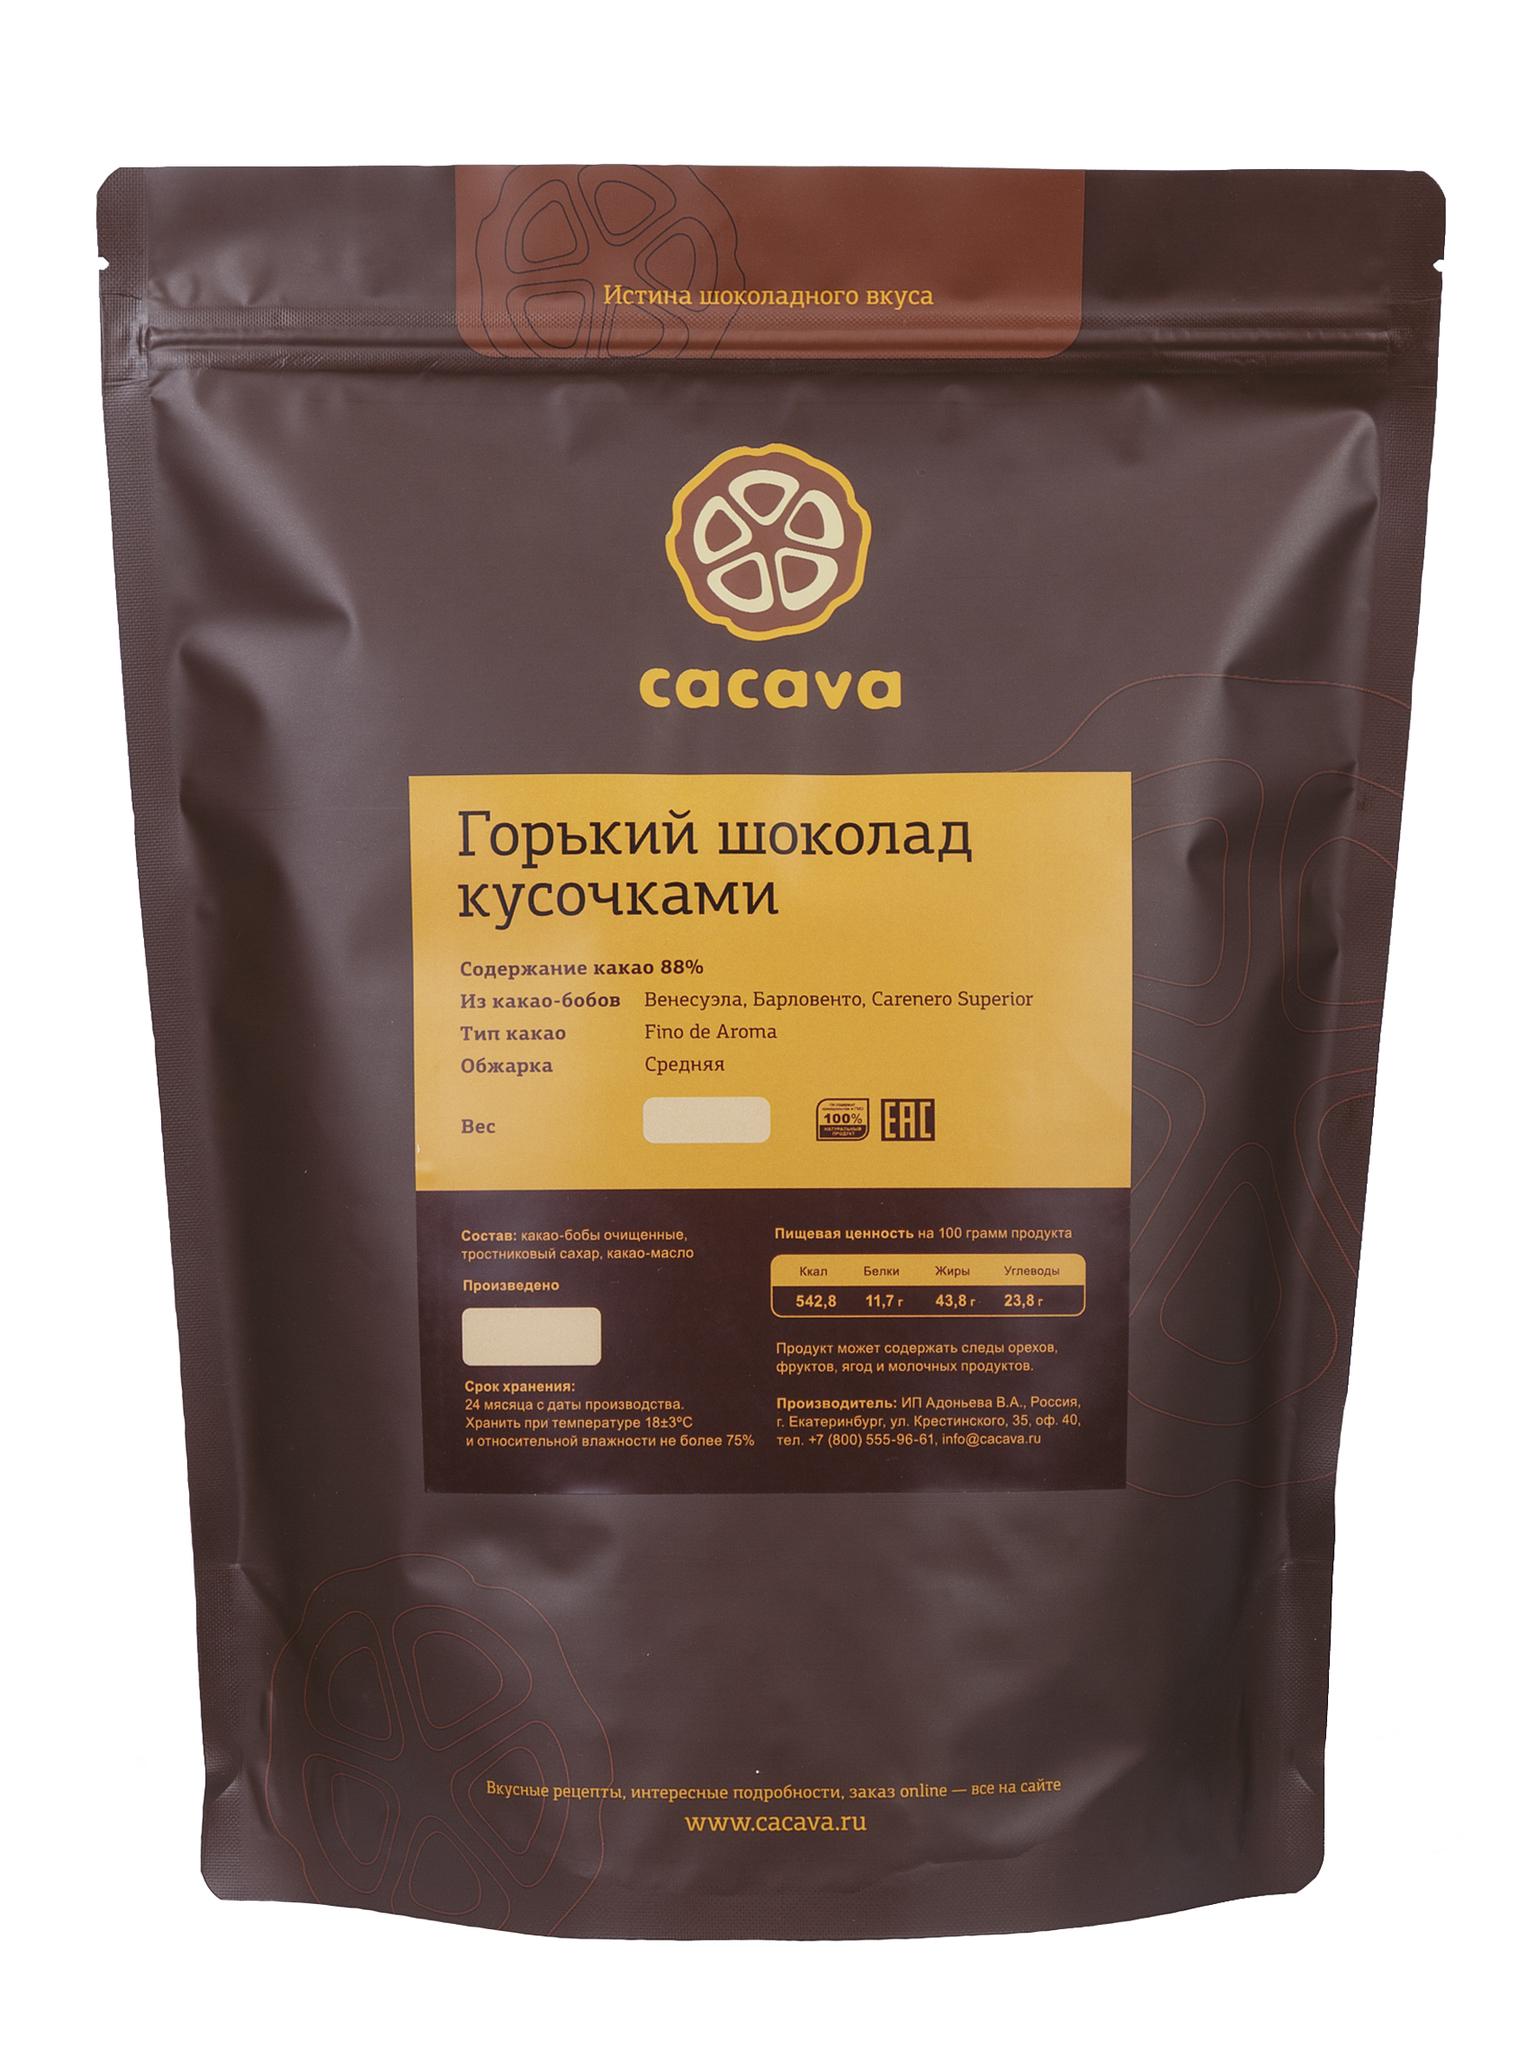 Горький шоколад 88 % какао (Венесуэла), упаковка 1 кг